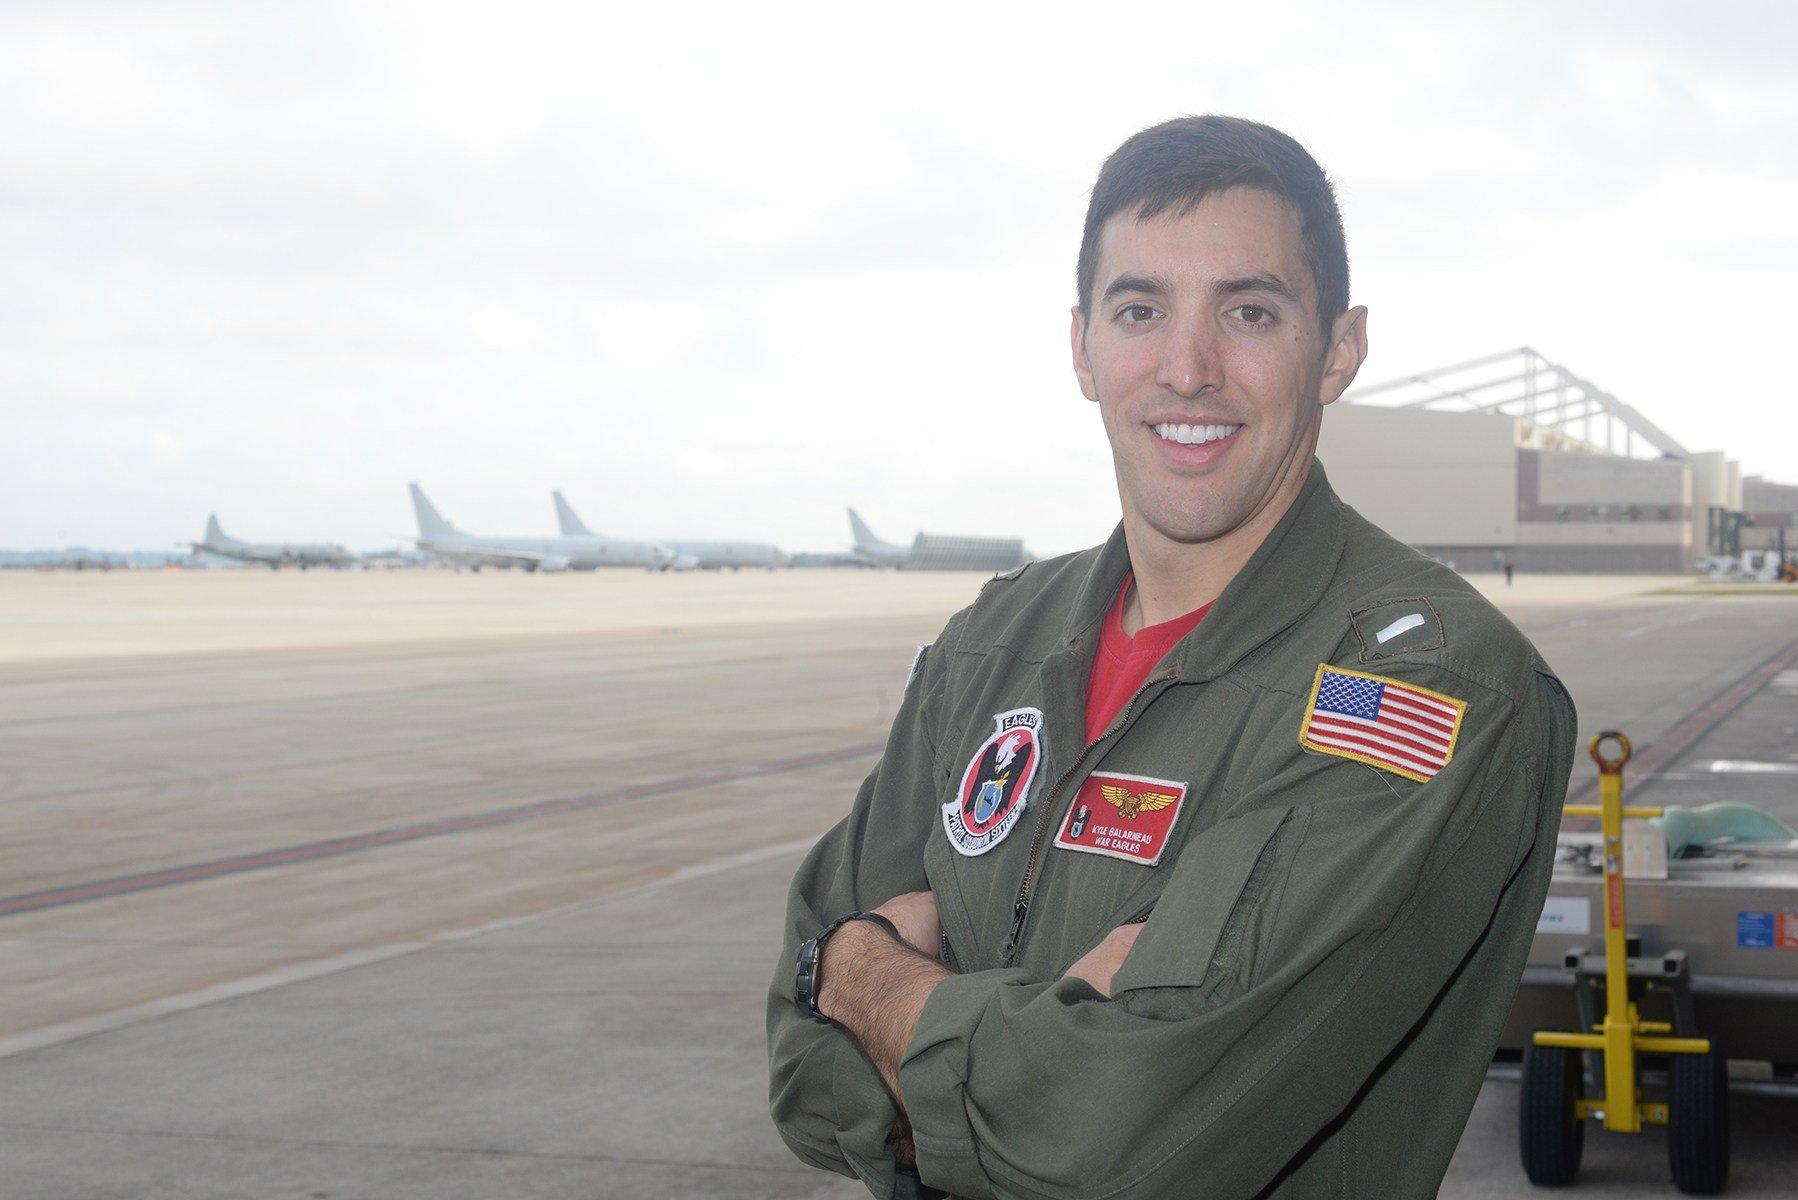 Lt. j. g. Kyle Galarneau serves as a naval flight officer. (U.S. Navy)